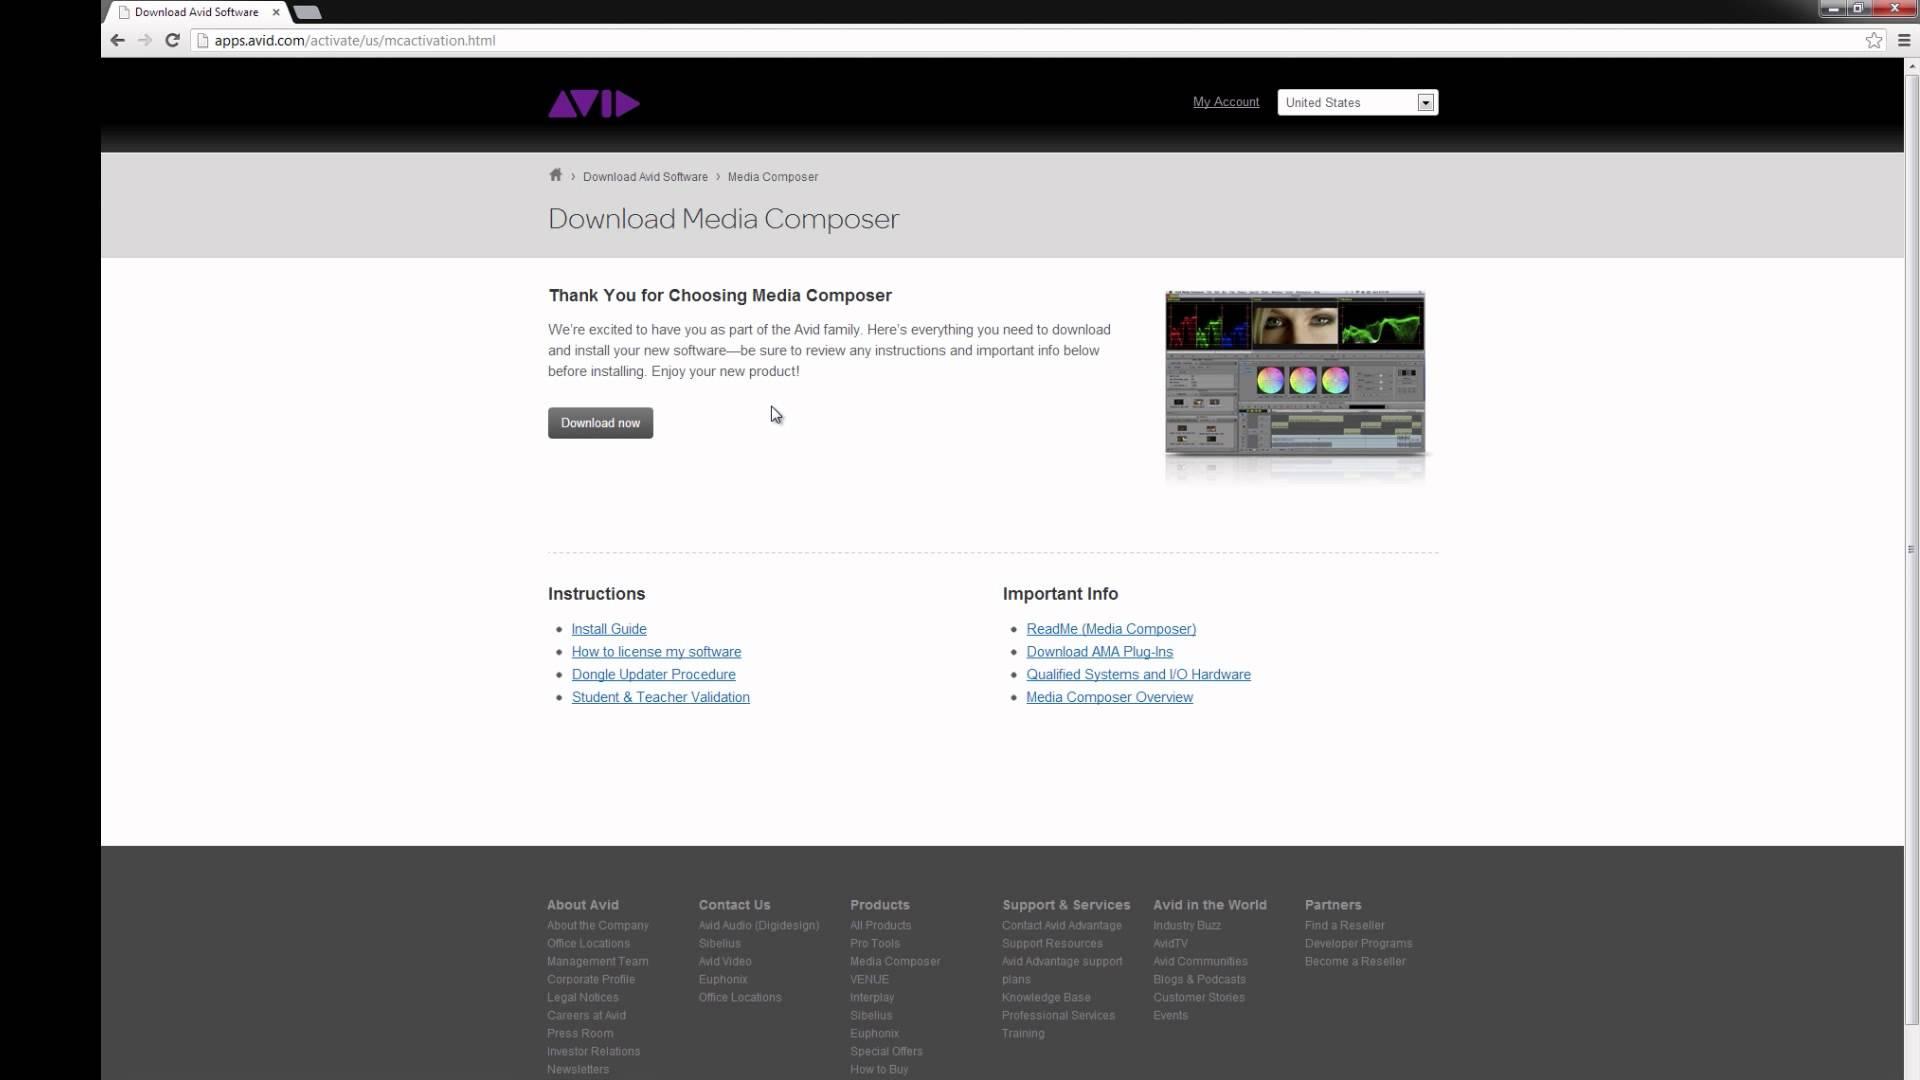 Survival Guide ‒ Media Composer® Student Upgrade ‒ Avid®